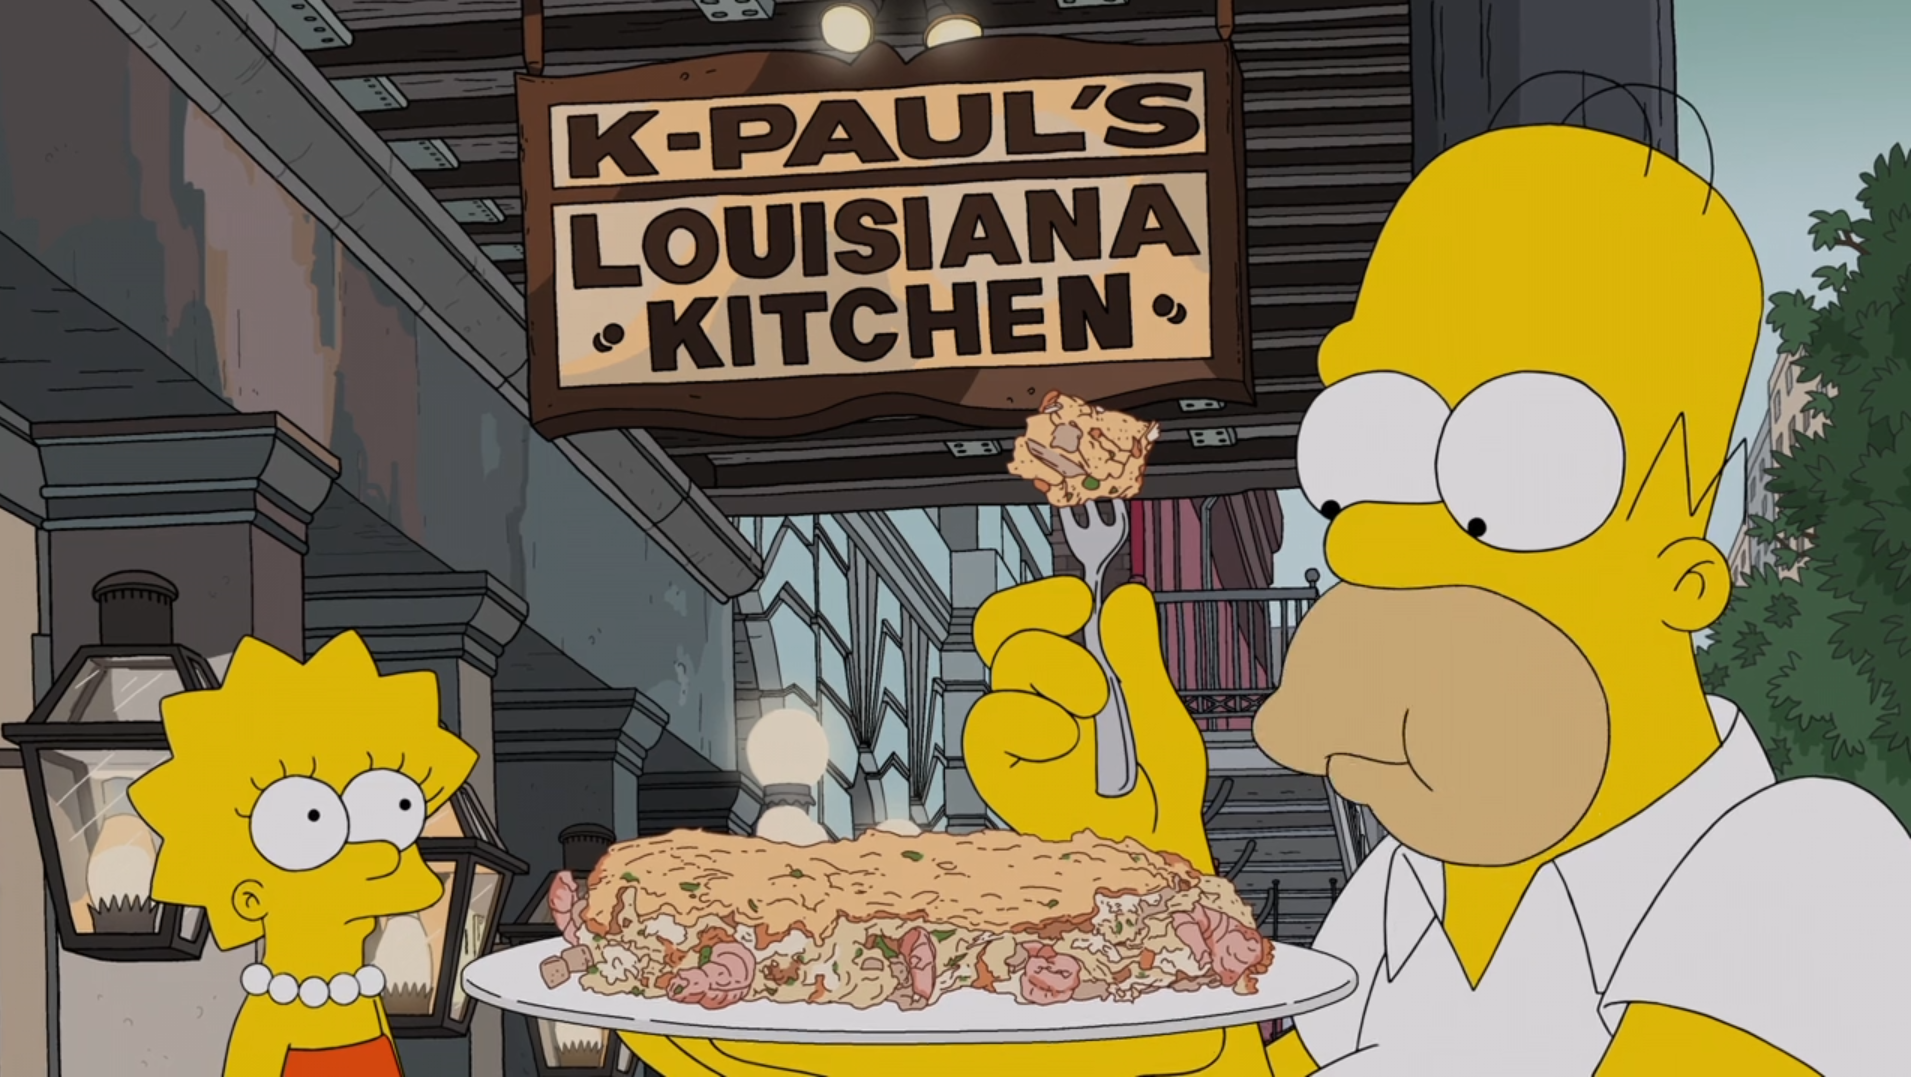 K-Paul's Louisiana Kitchen.png